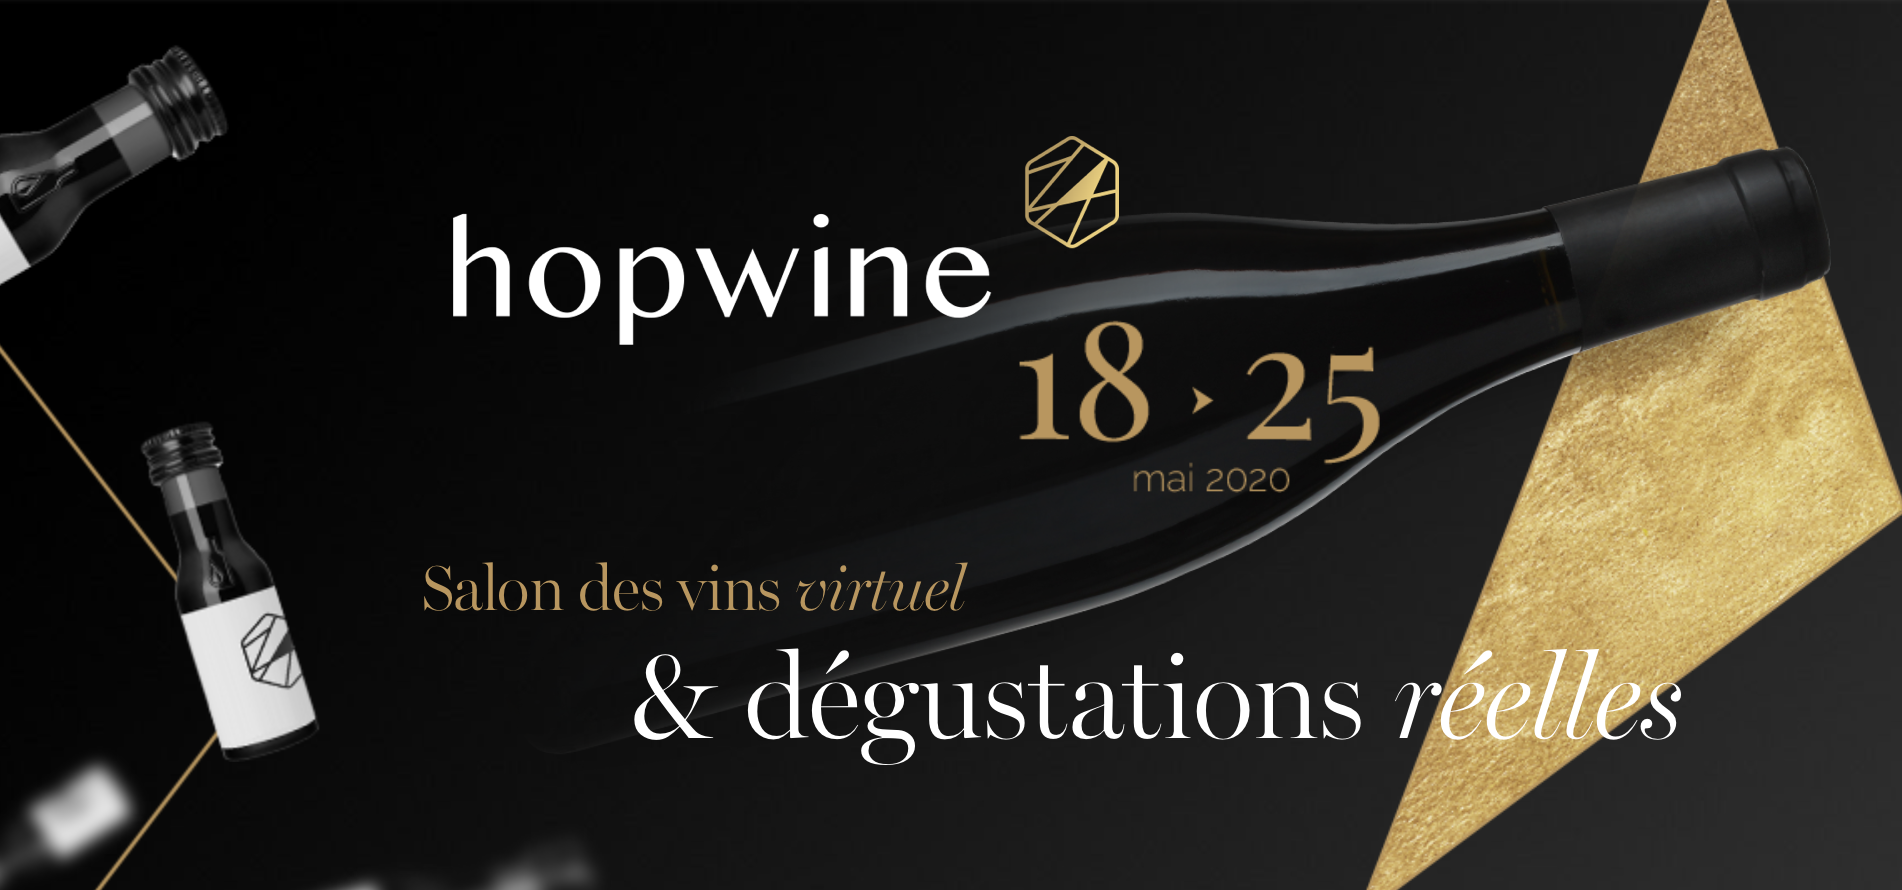 Hopwine 2020